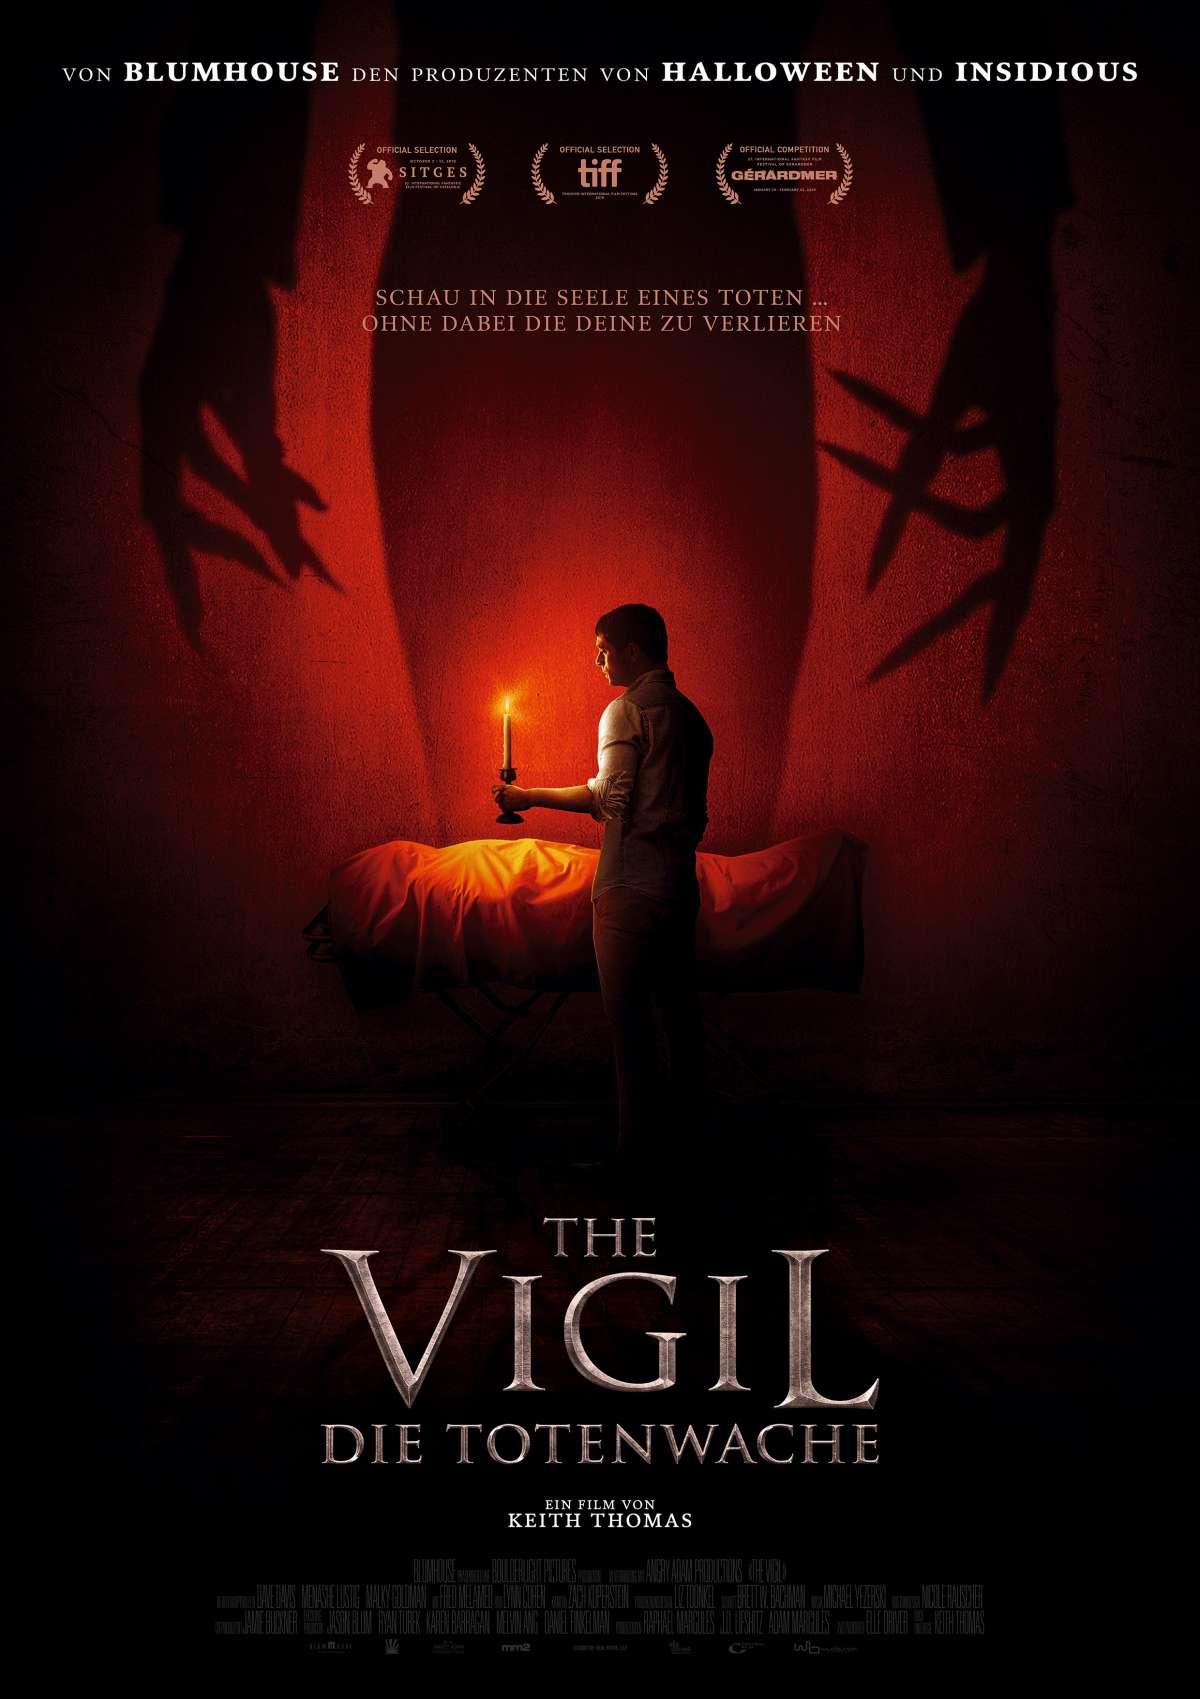 The Vigil - Die Totenwache - Cine-Royal  - Fritzlar